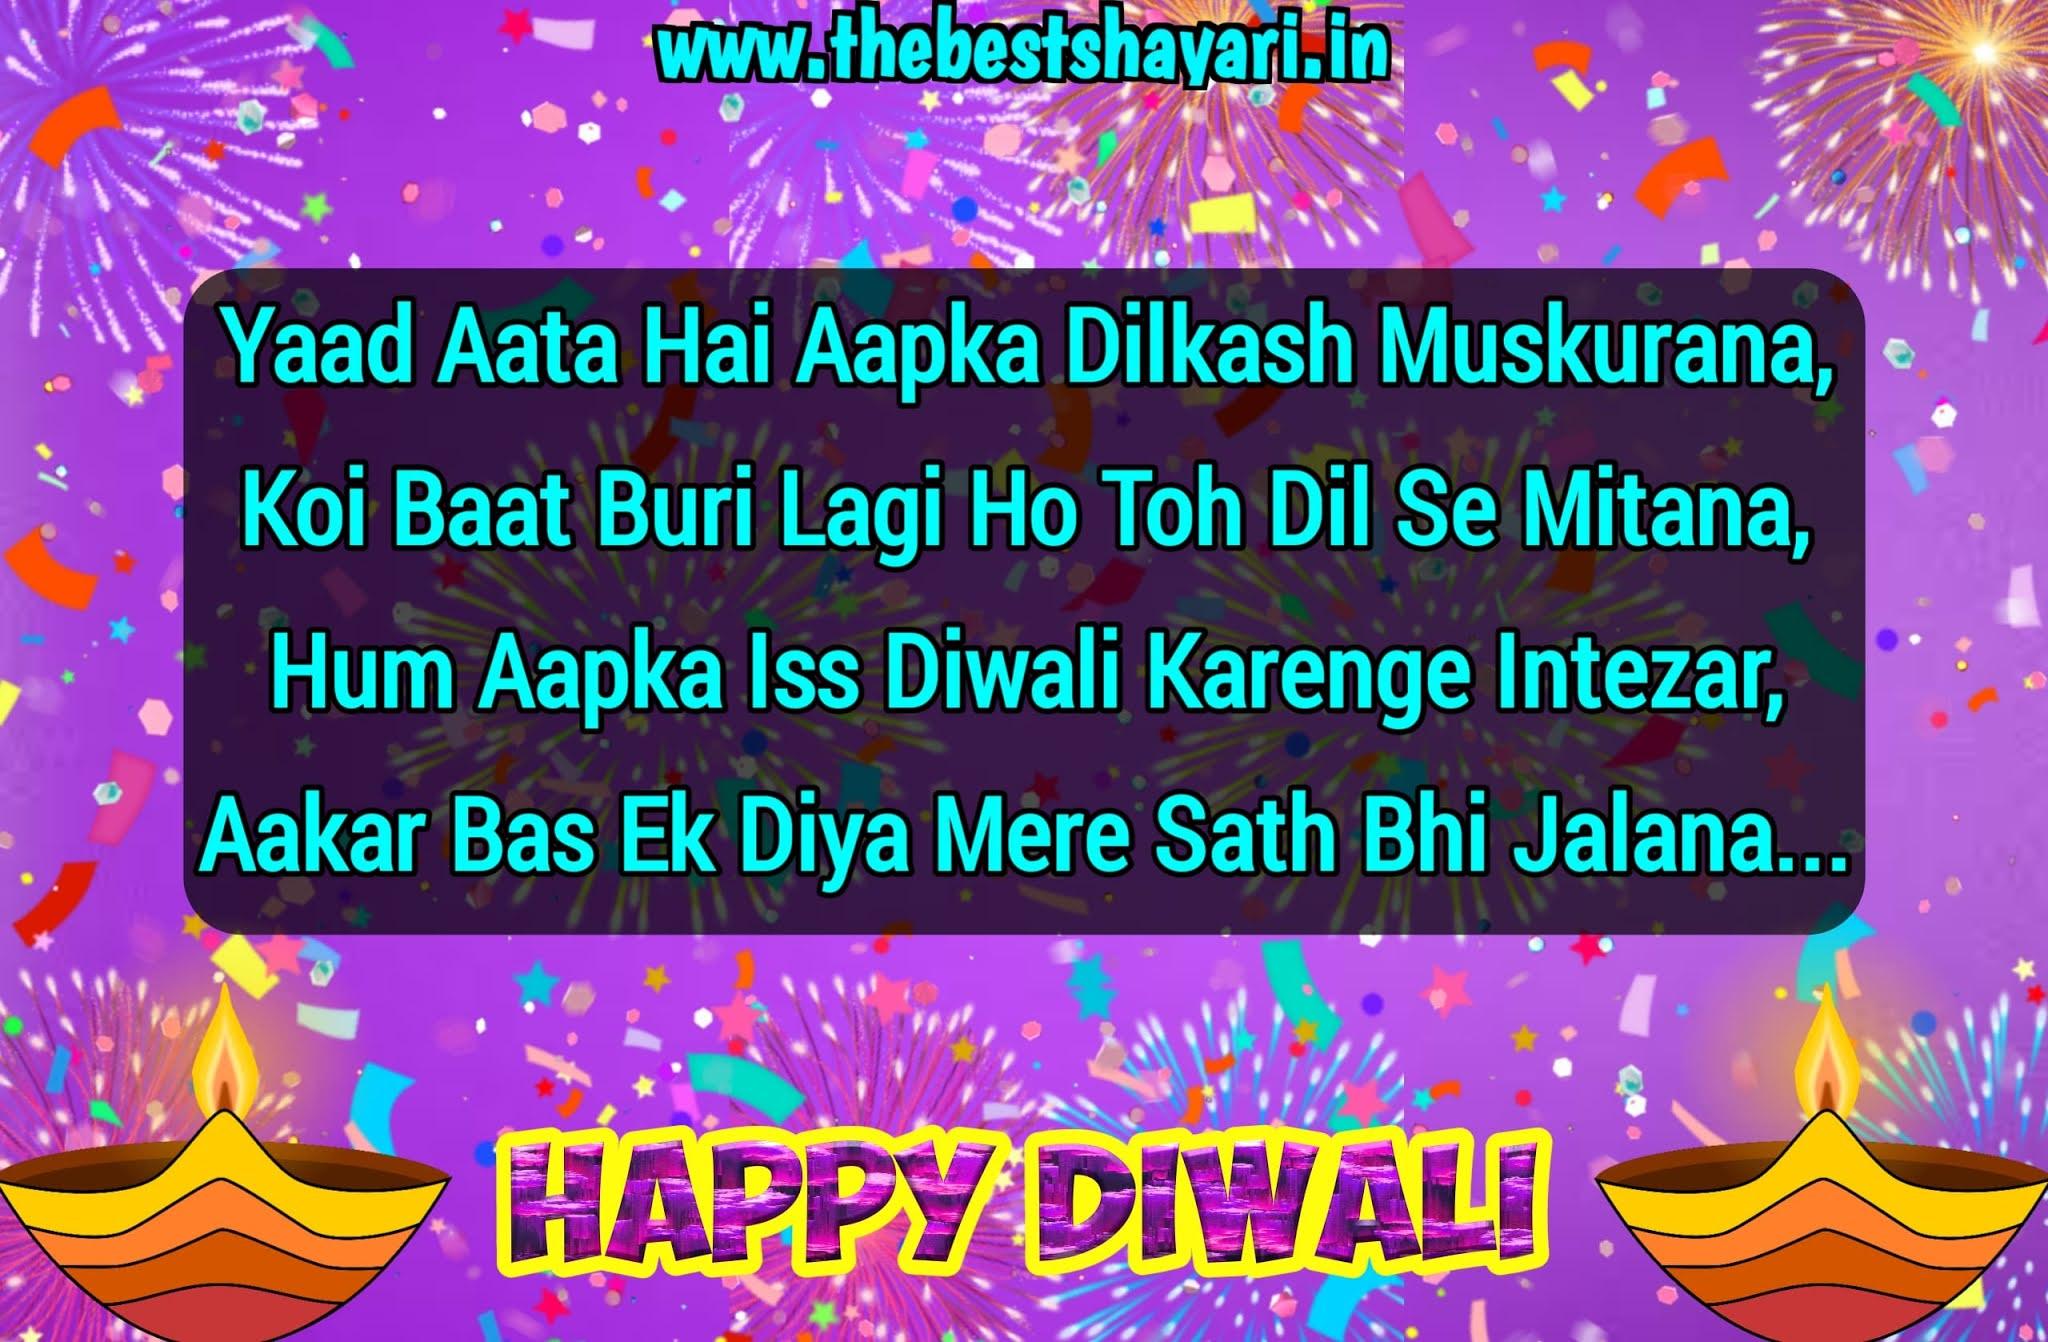 diwali wishes with photo